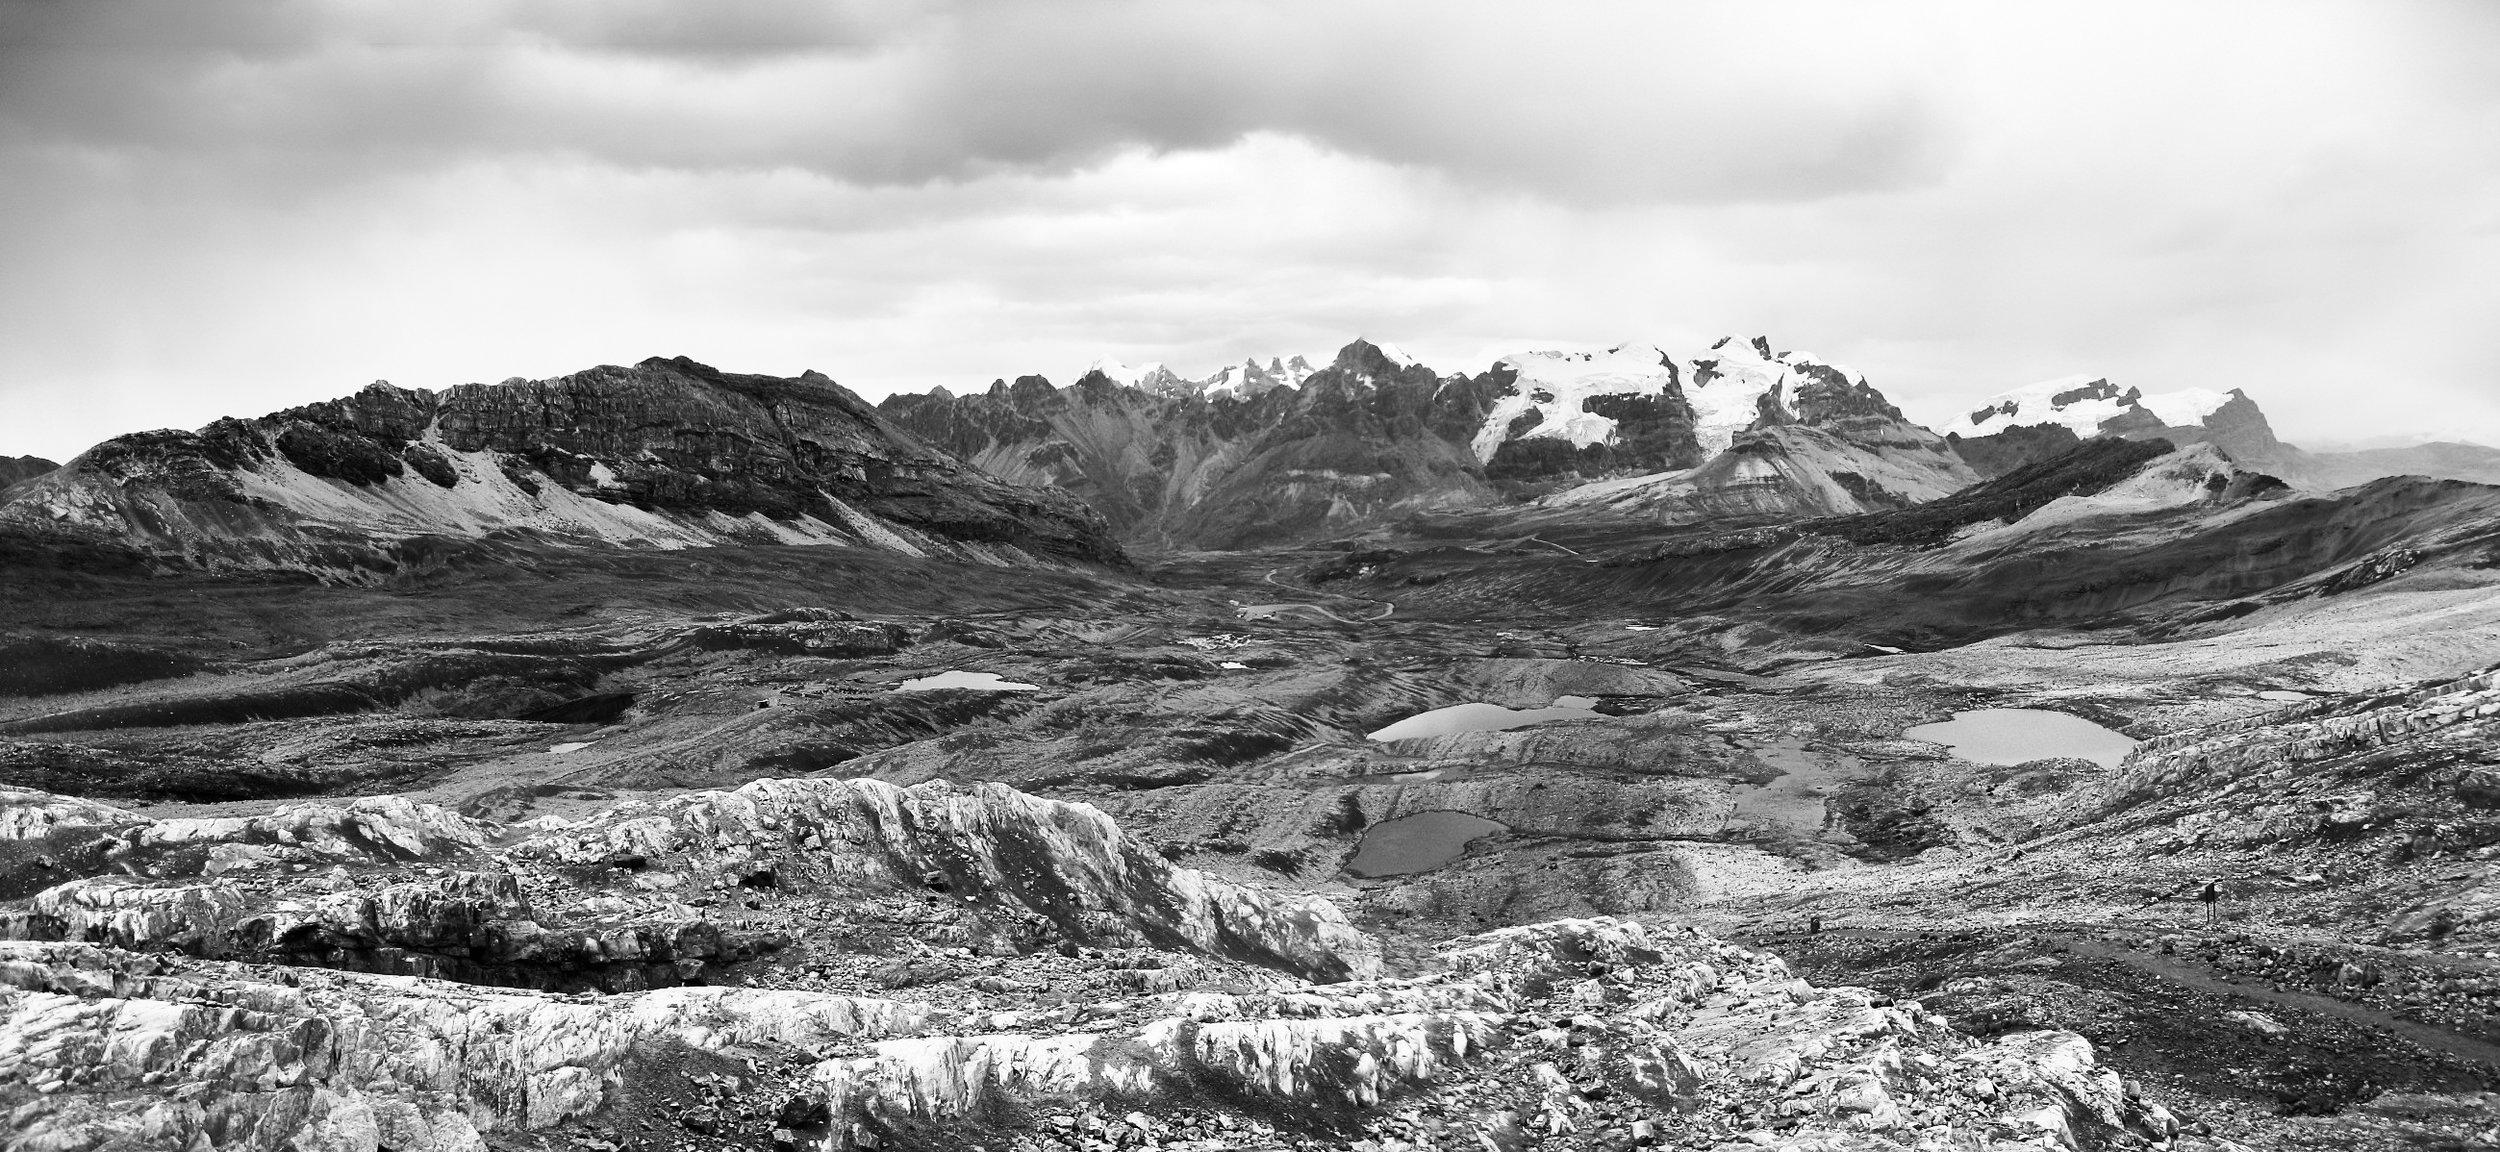 huaraz_nevado_pasto_ruri_cumbre_5400m-1106-7-_high-rock-valley-with-mini-lakes.jpg